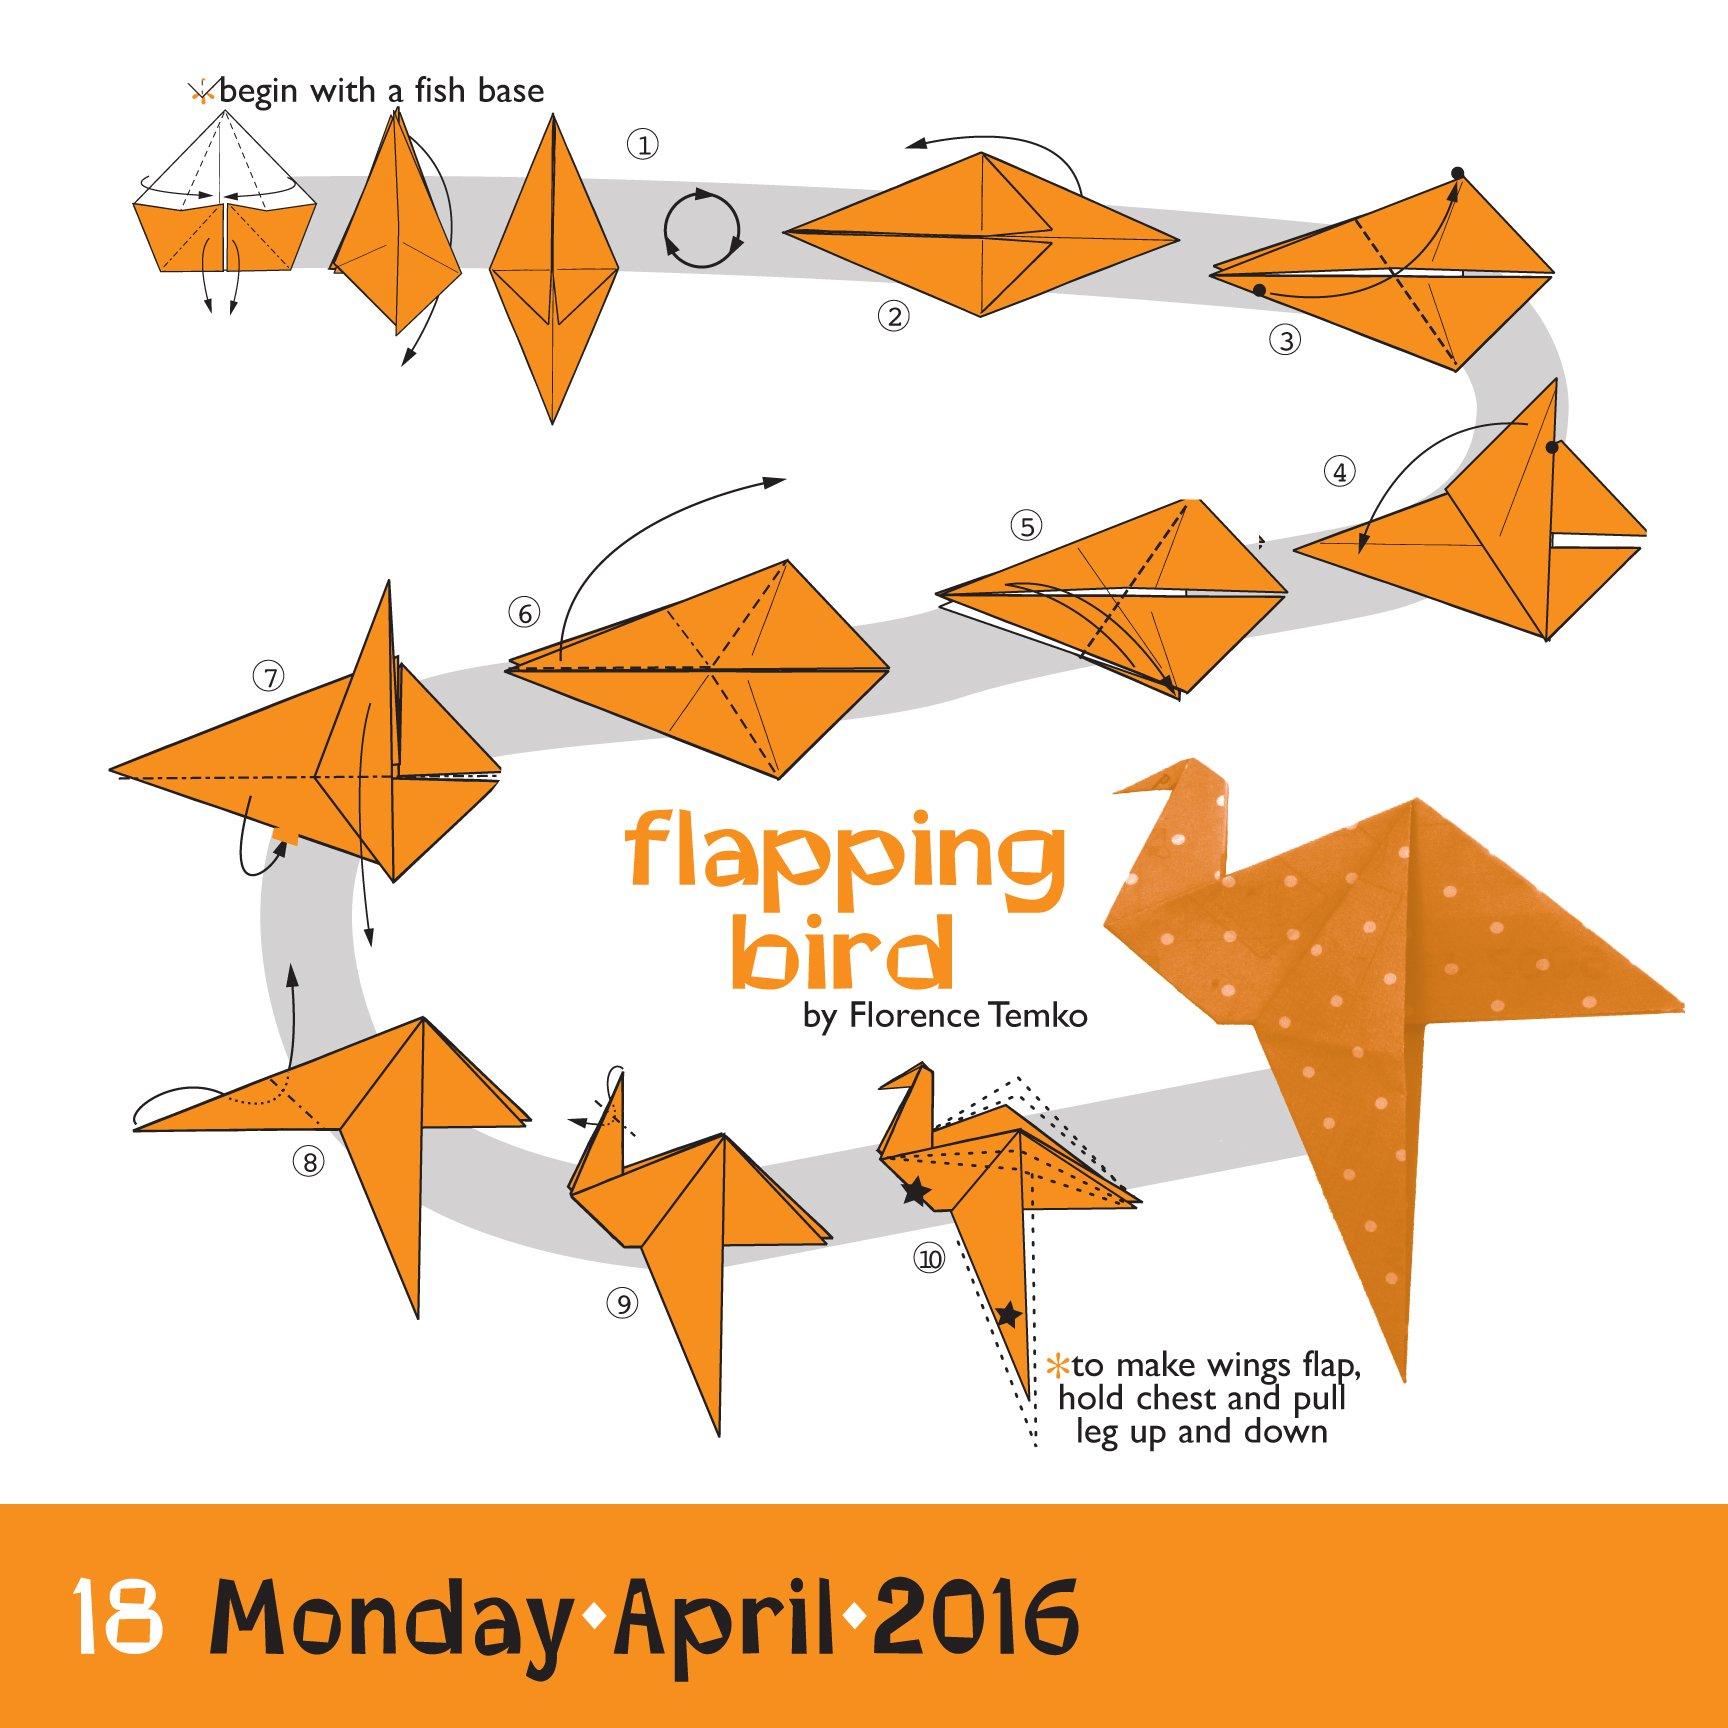 Origami color page a day calendar 2016 margaret van sicklen origami color page a day calendar 2016 margaret van sicklen 9780761182986 amazon books jeuxipadfo Image collections